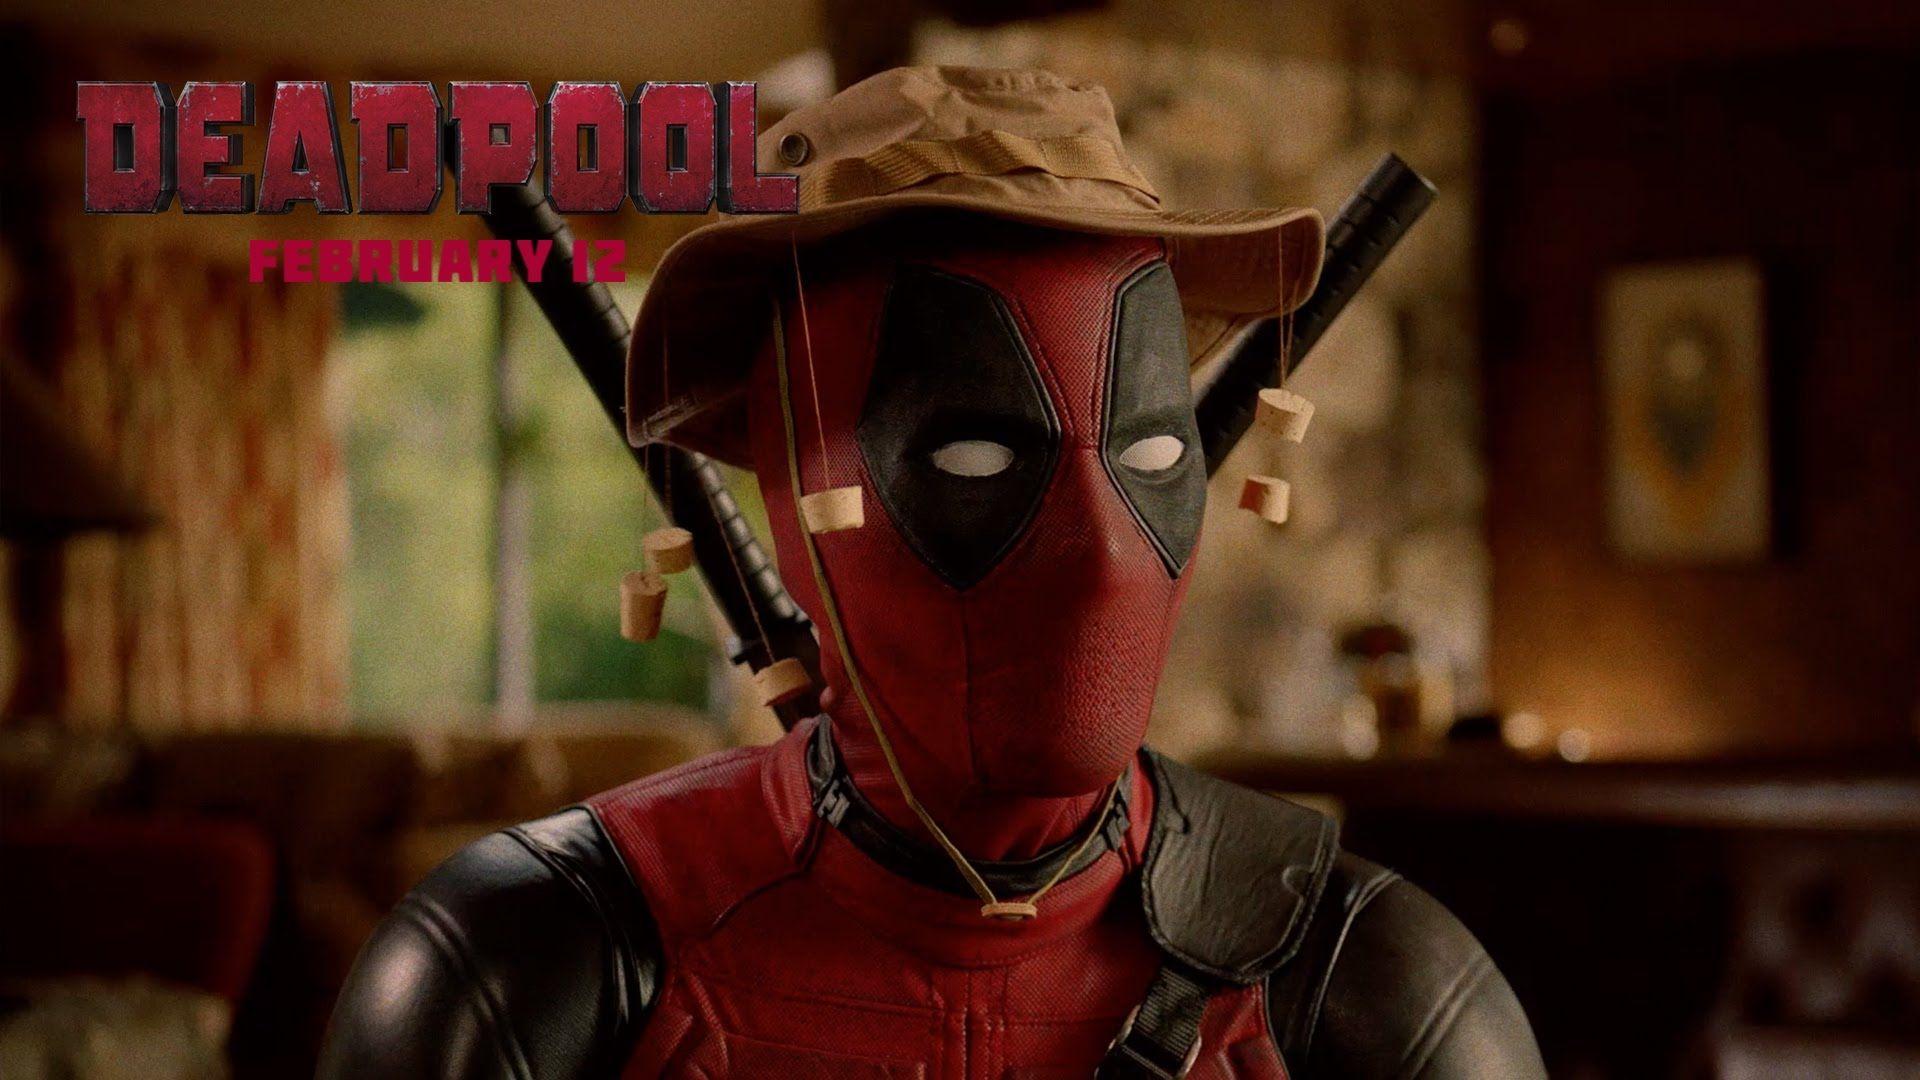 Top Wallpaper Movie Deadpool - 71c42ef4fba7b92d31ddd907509cdeef  Snapshot_201210.jpg